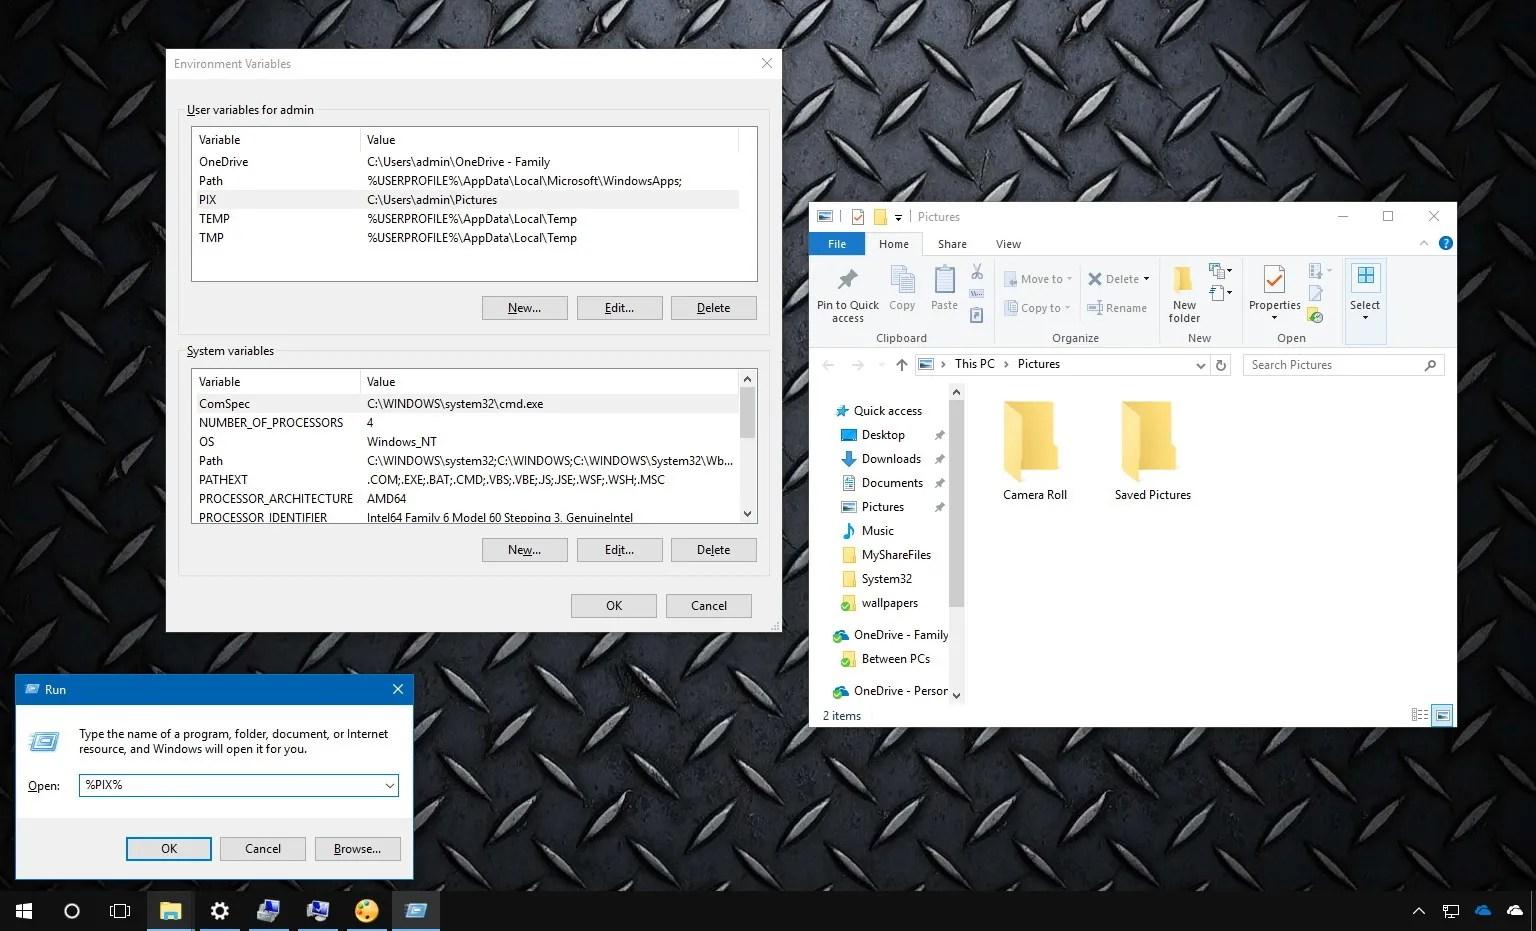 Windows 10 custom environment variables